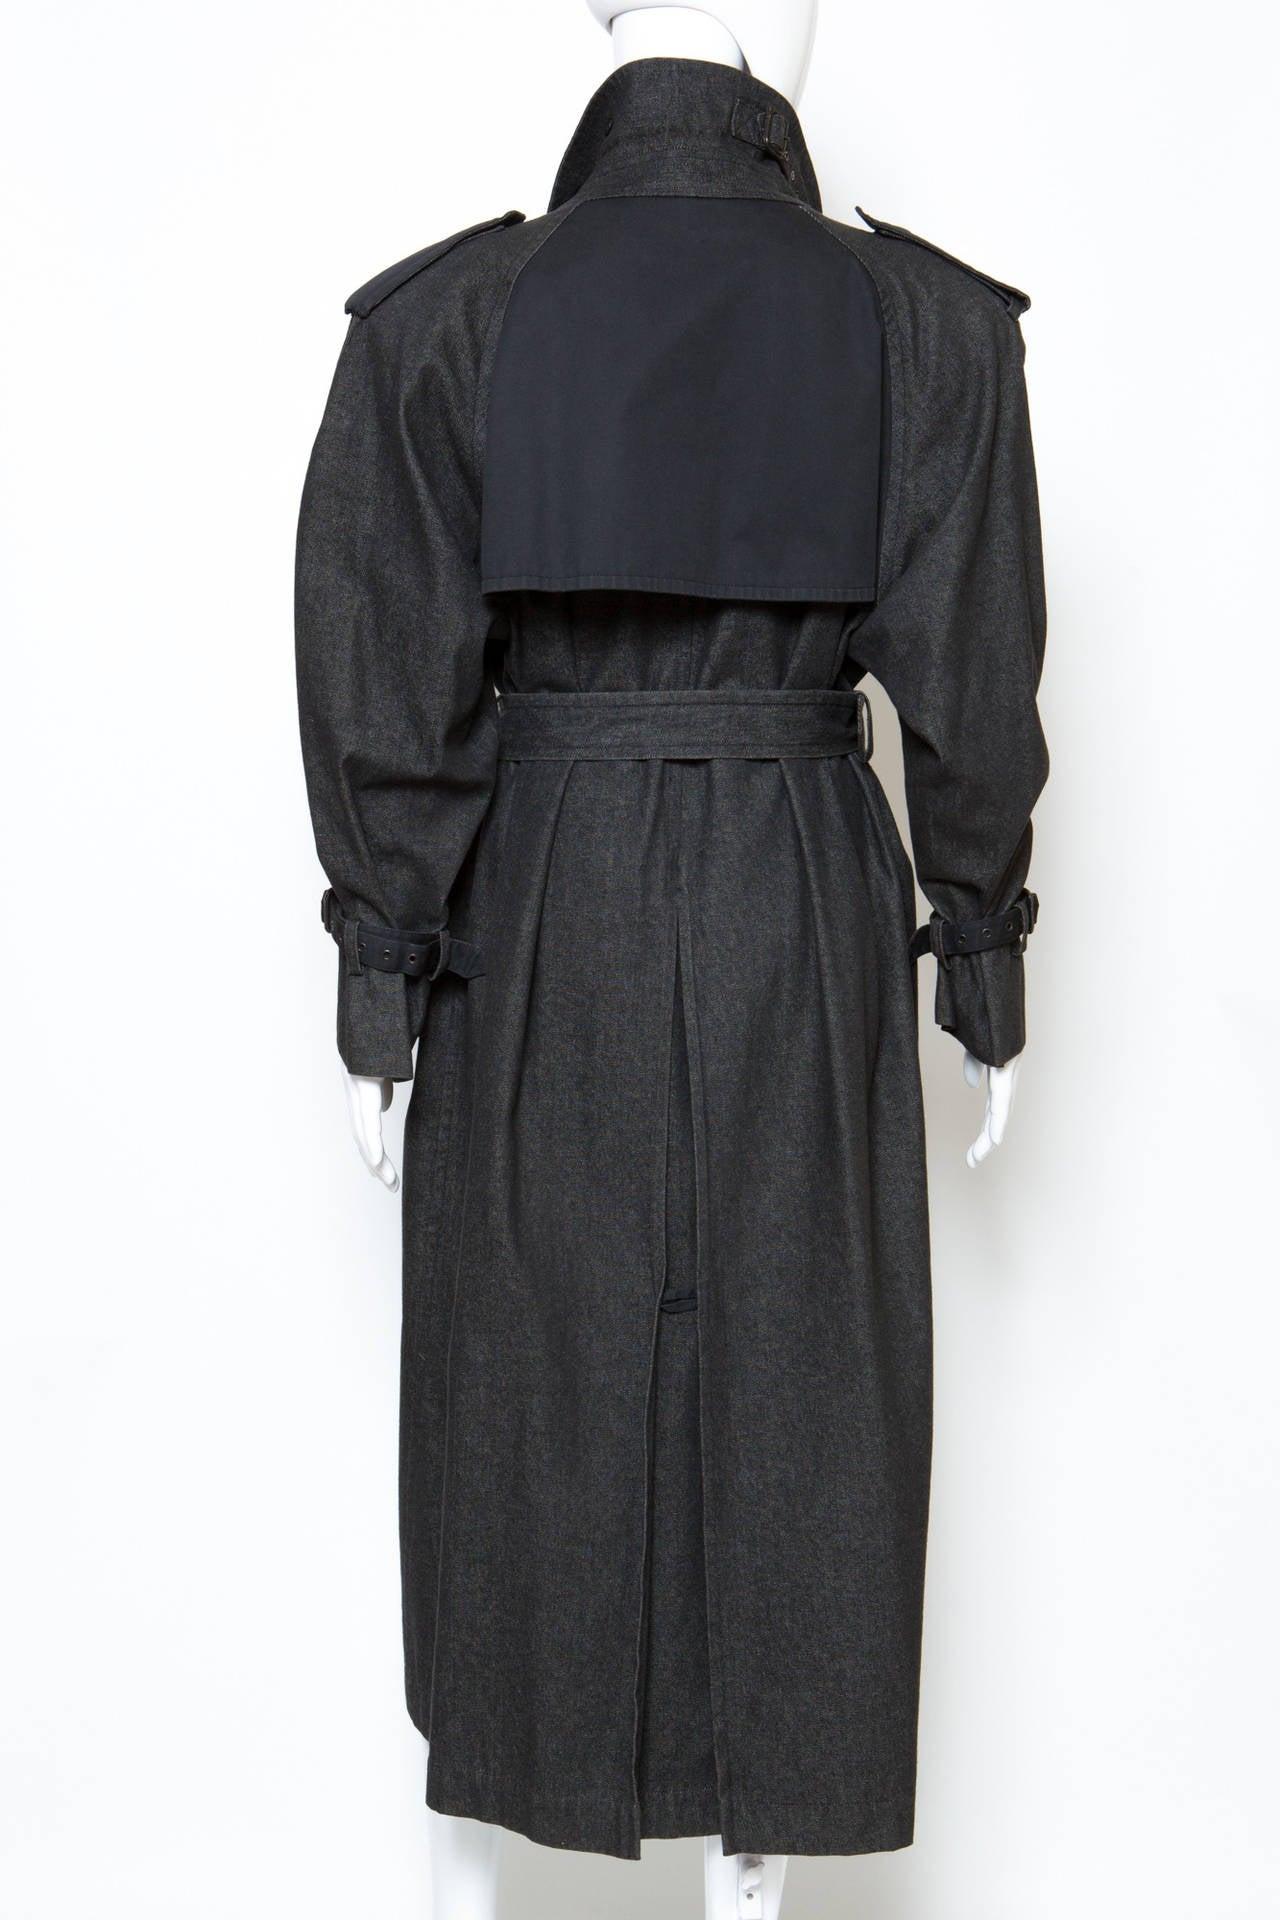 1980s Gorgeous Yves Saint Laurent Black Denim Trench 5